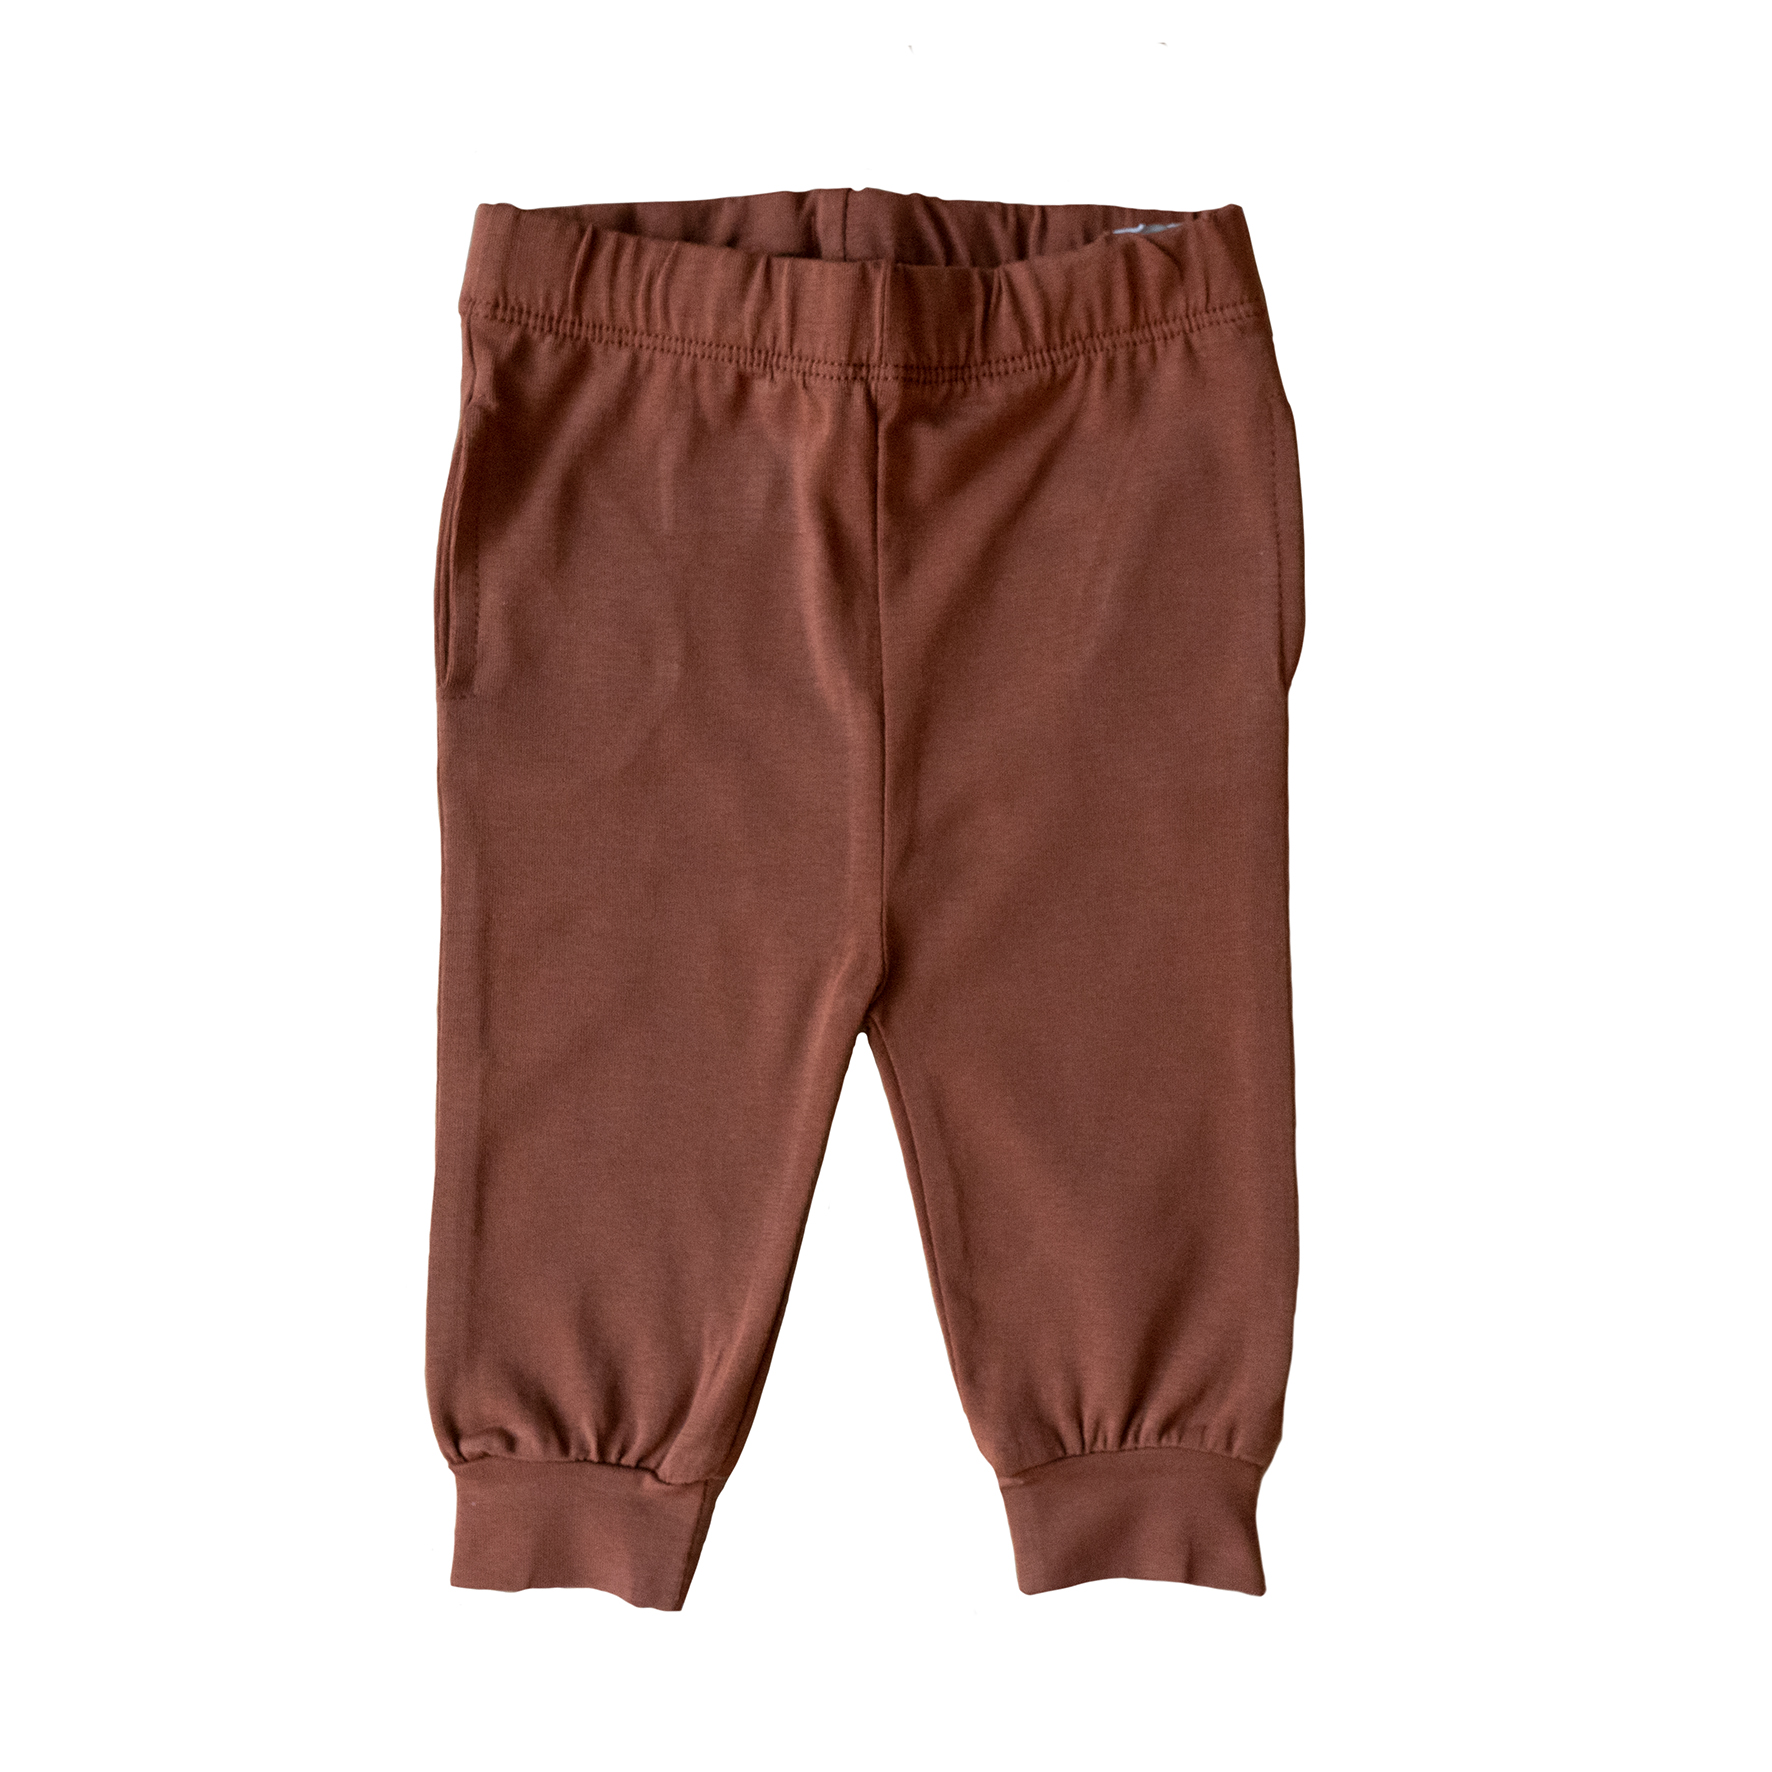 Copper brown jerseybyxor